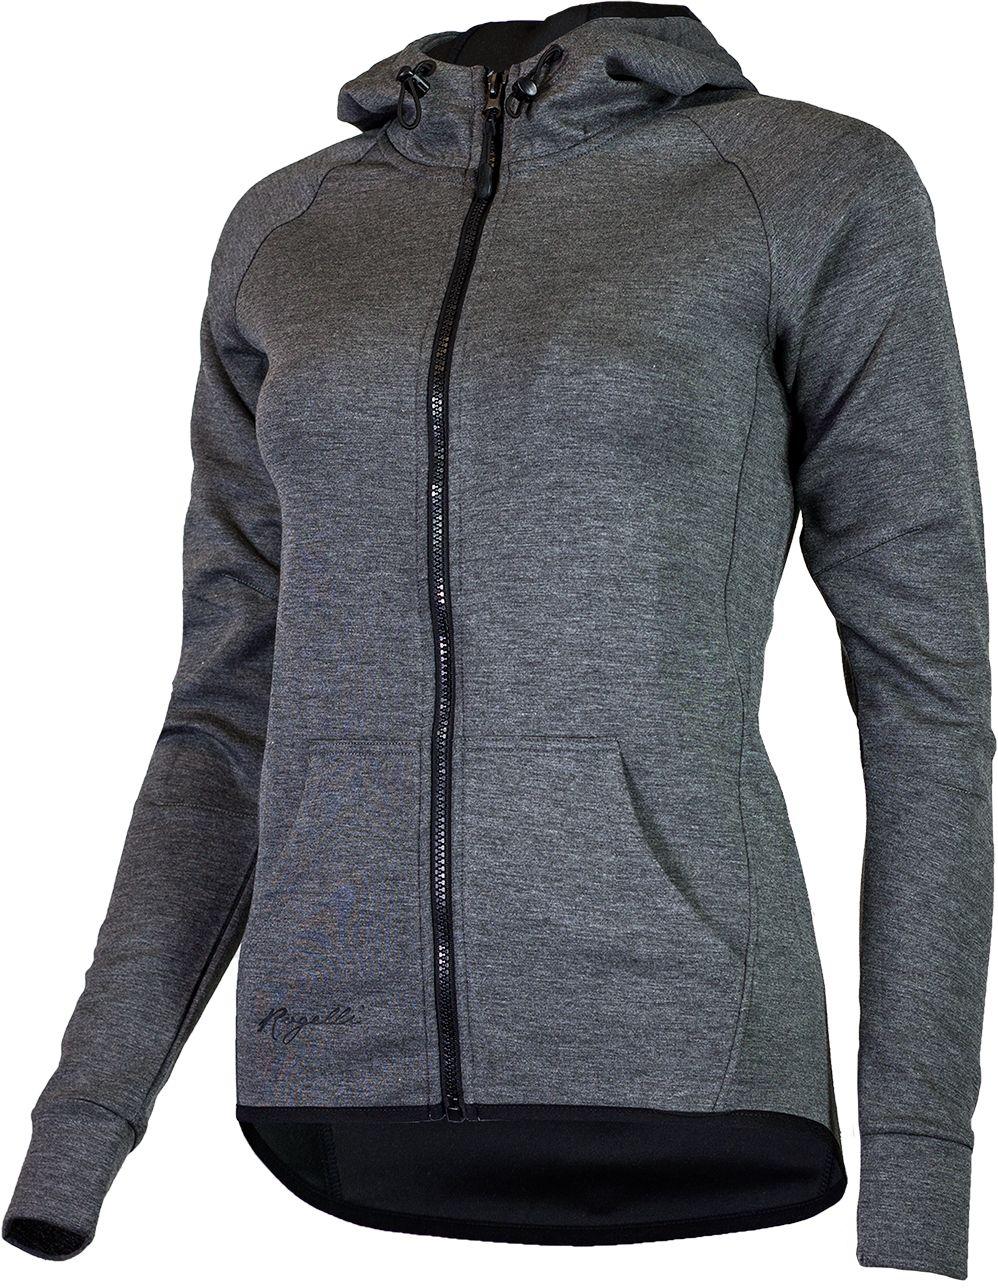 ROGELLI damska bluza z kapturem TRAINING szara Rozmiar: M,050.609.XS